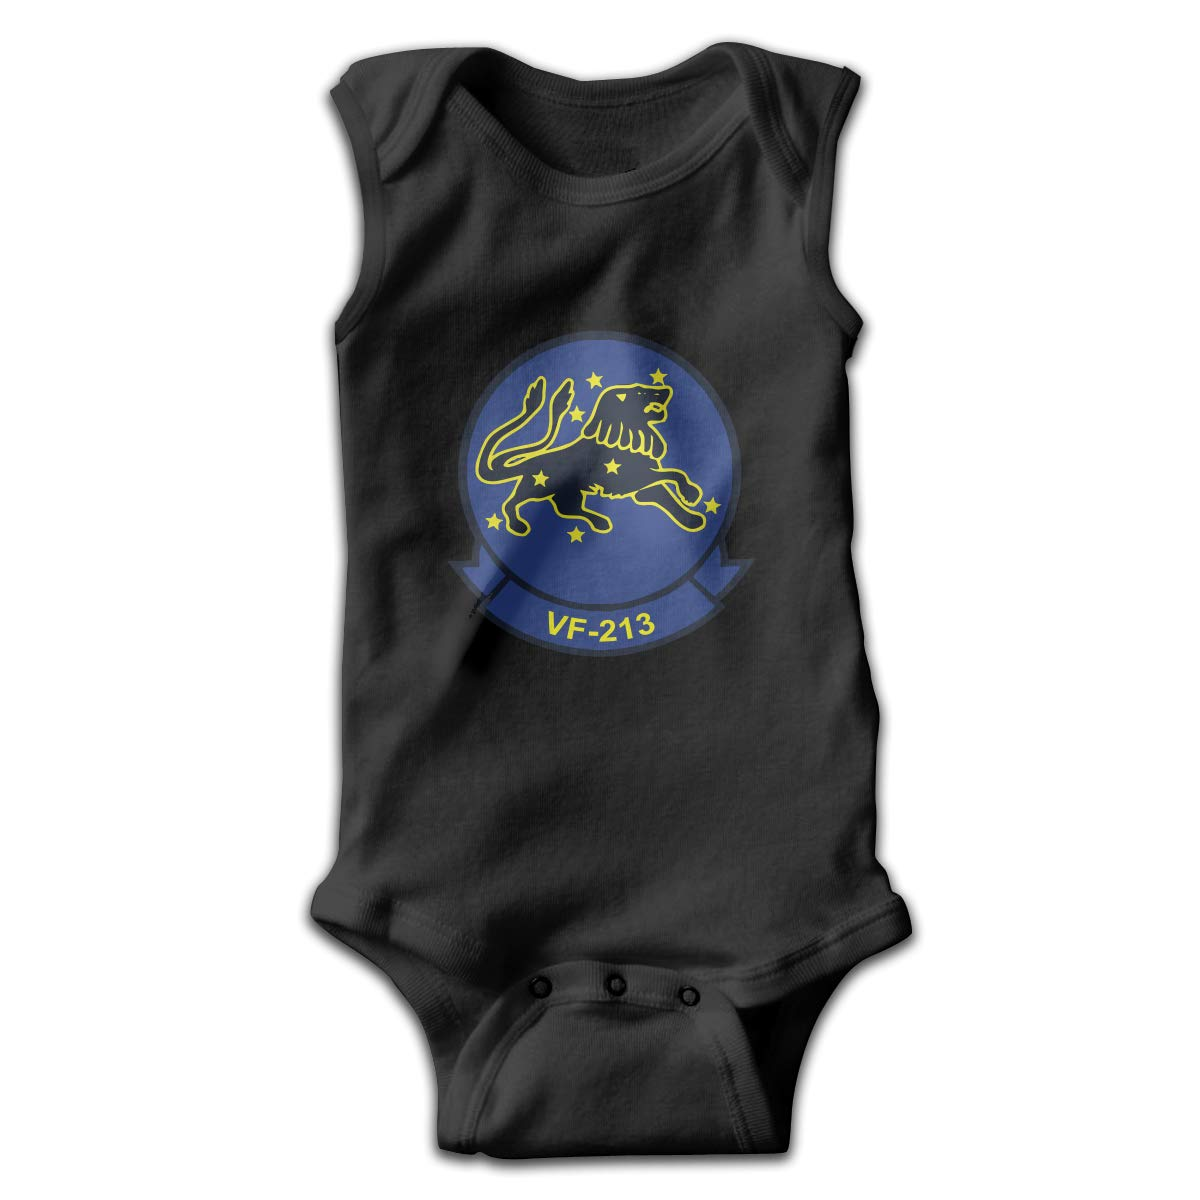 Dunpaiaa California Republic Smalls Baby Onesie,Infant Bodysuit Black